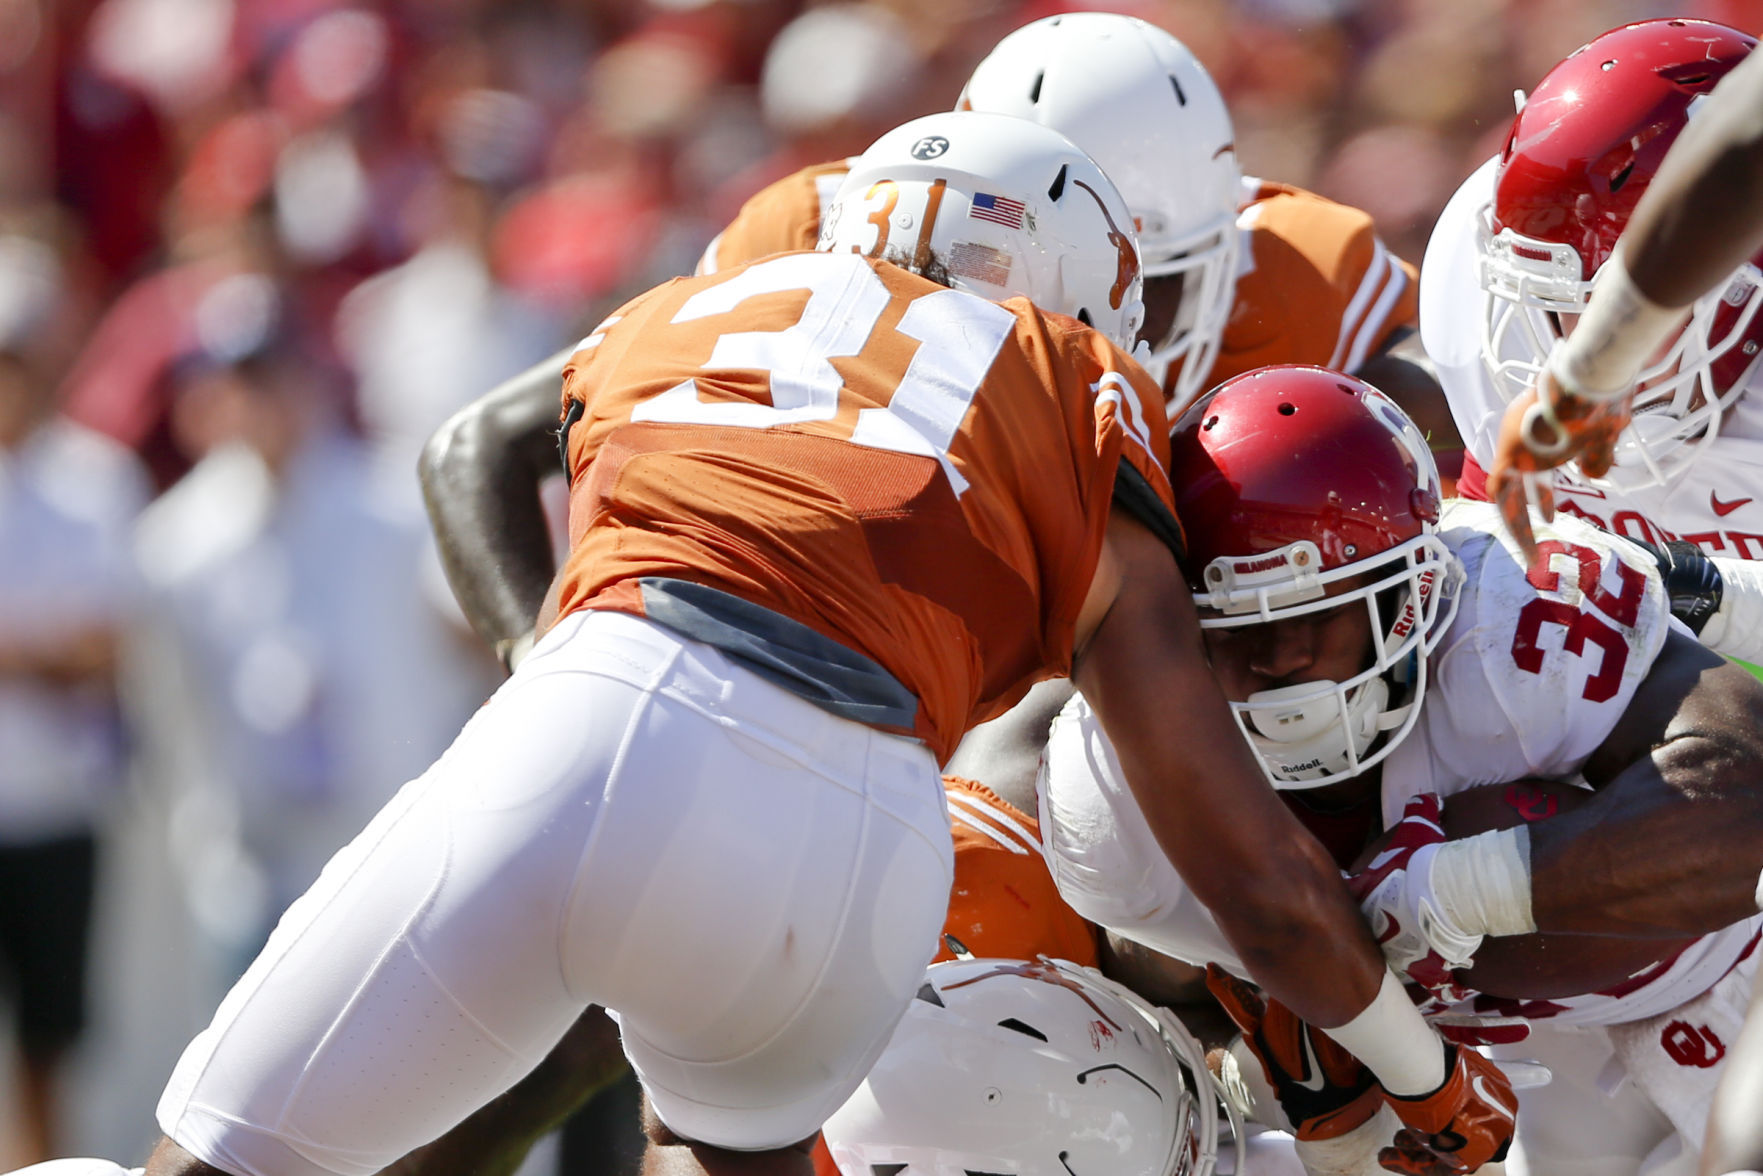 Texas coach Strong enters Oklahoma game under pressure again